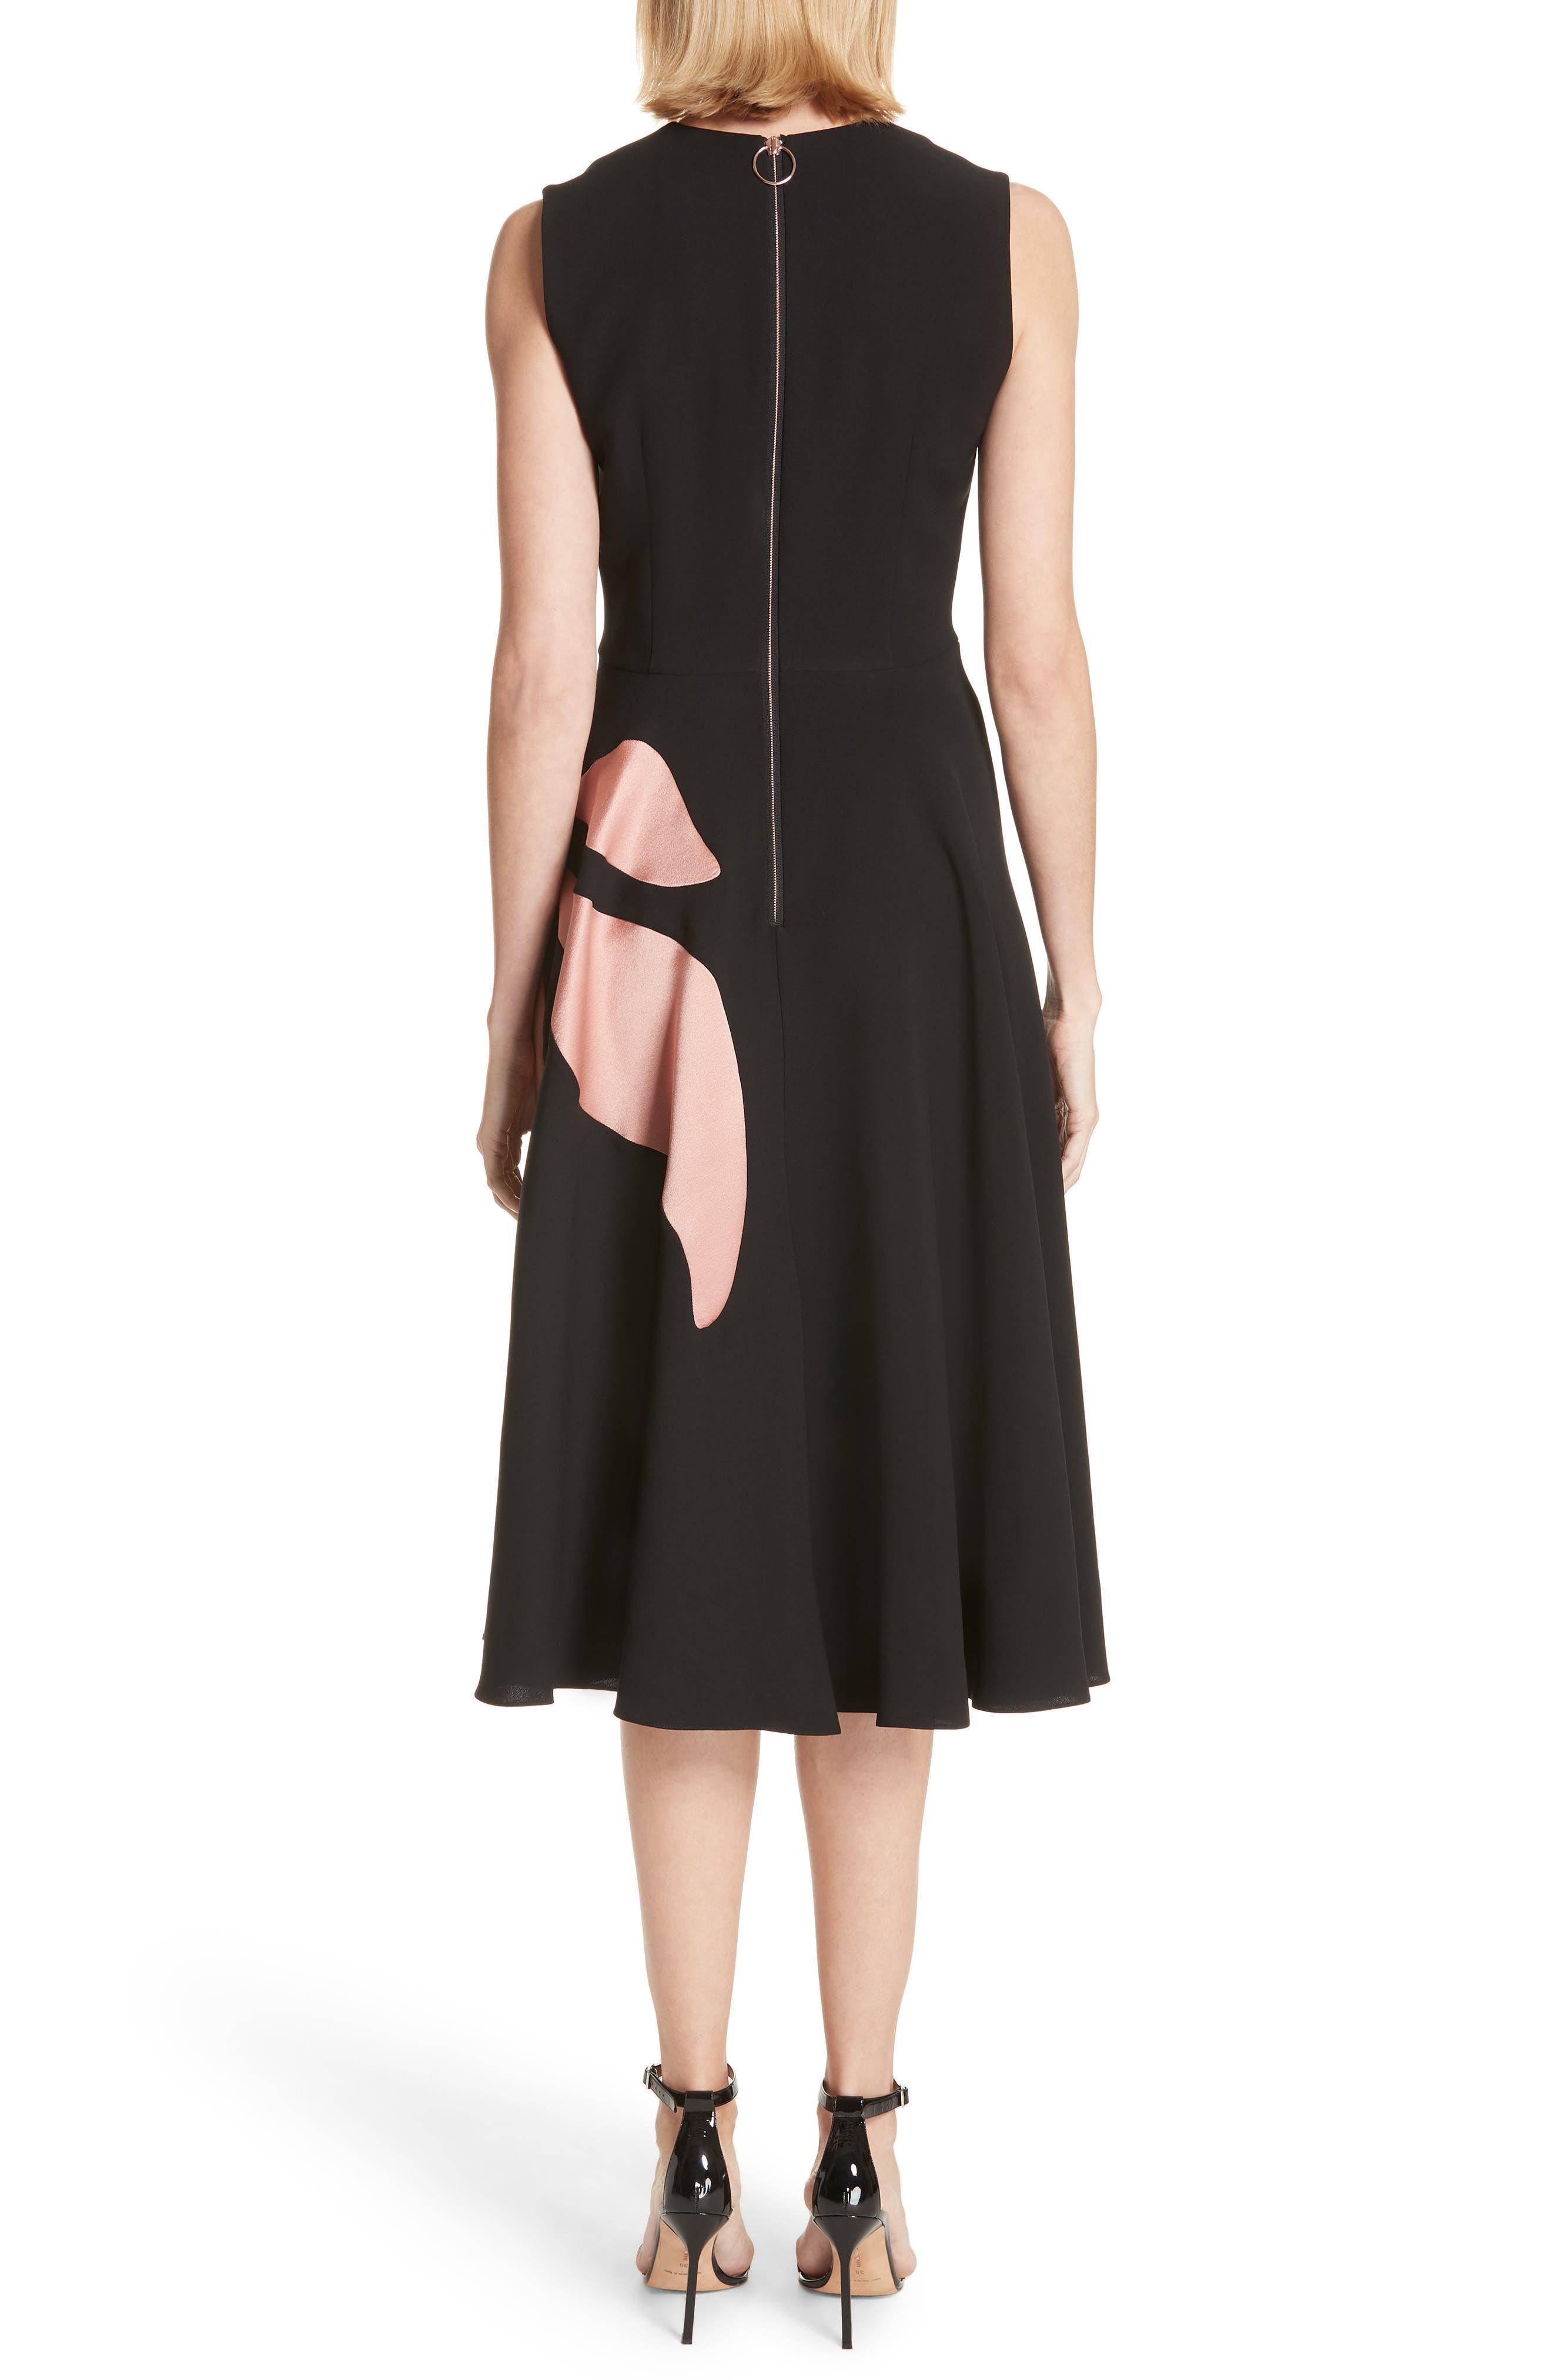 Ilia Floral Inlay Silk Blend Dress,                             Alternate thumbnail 2, color,                             001